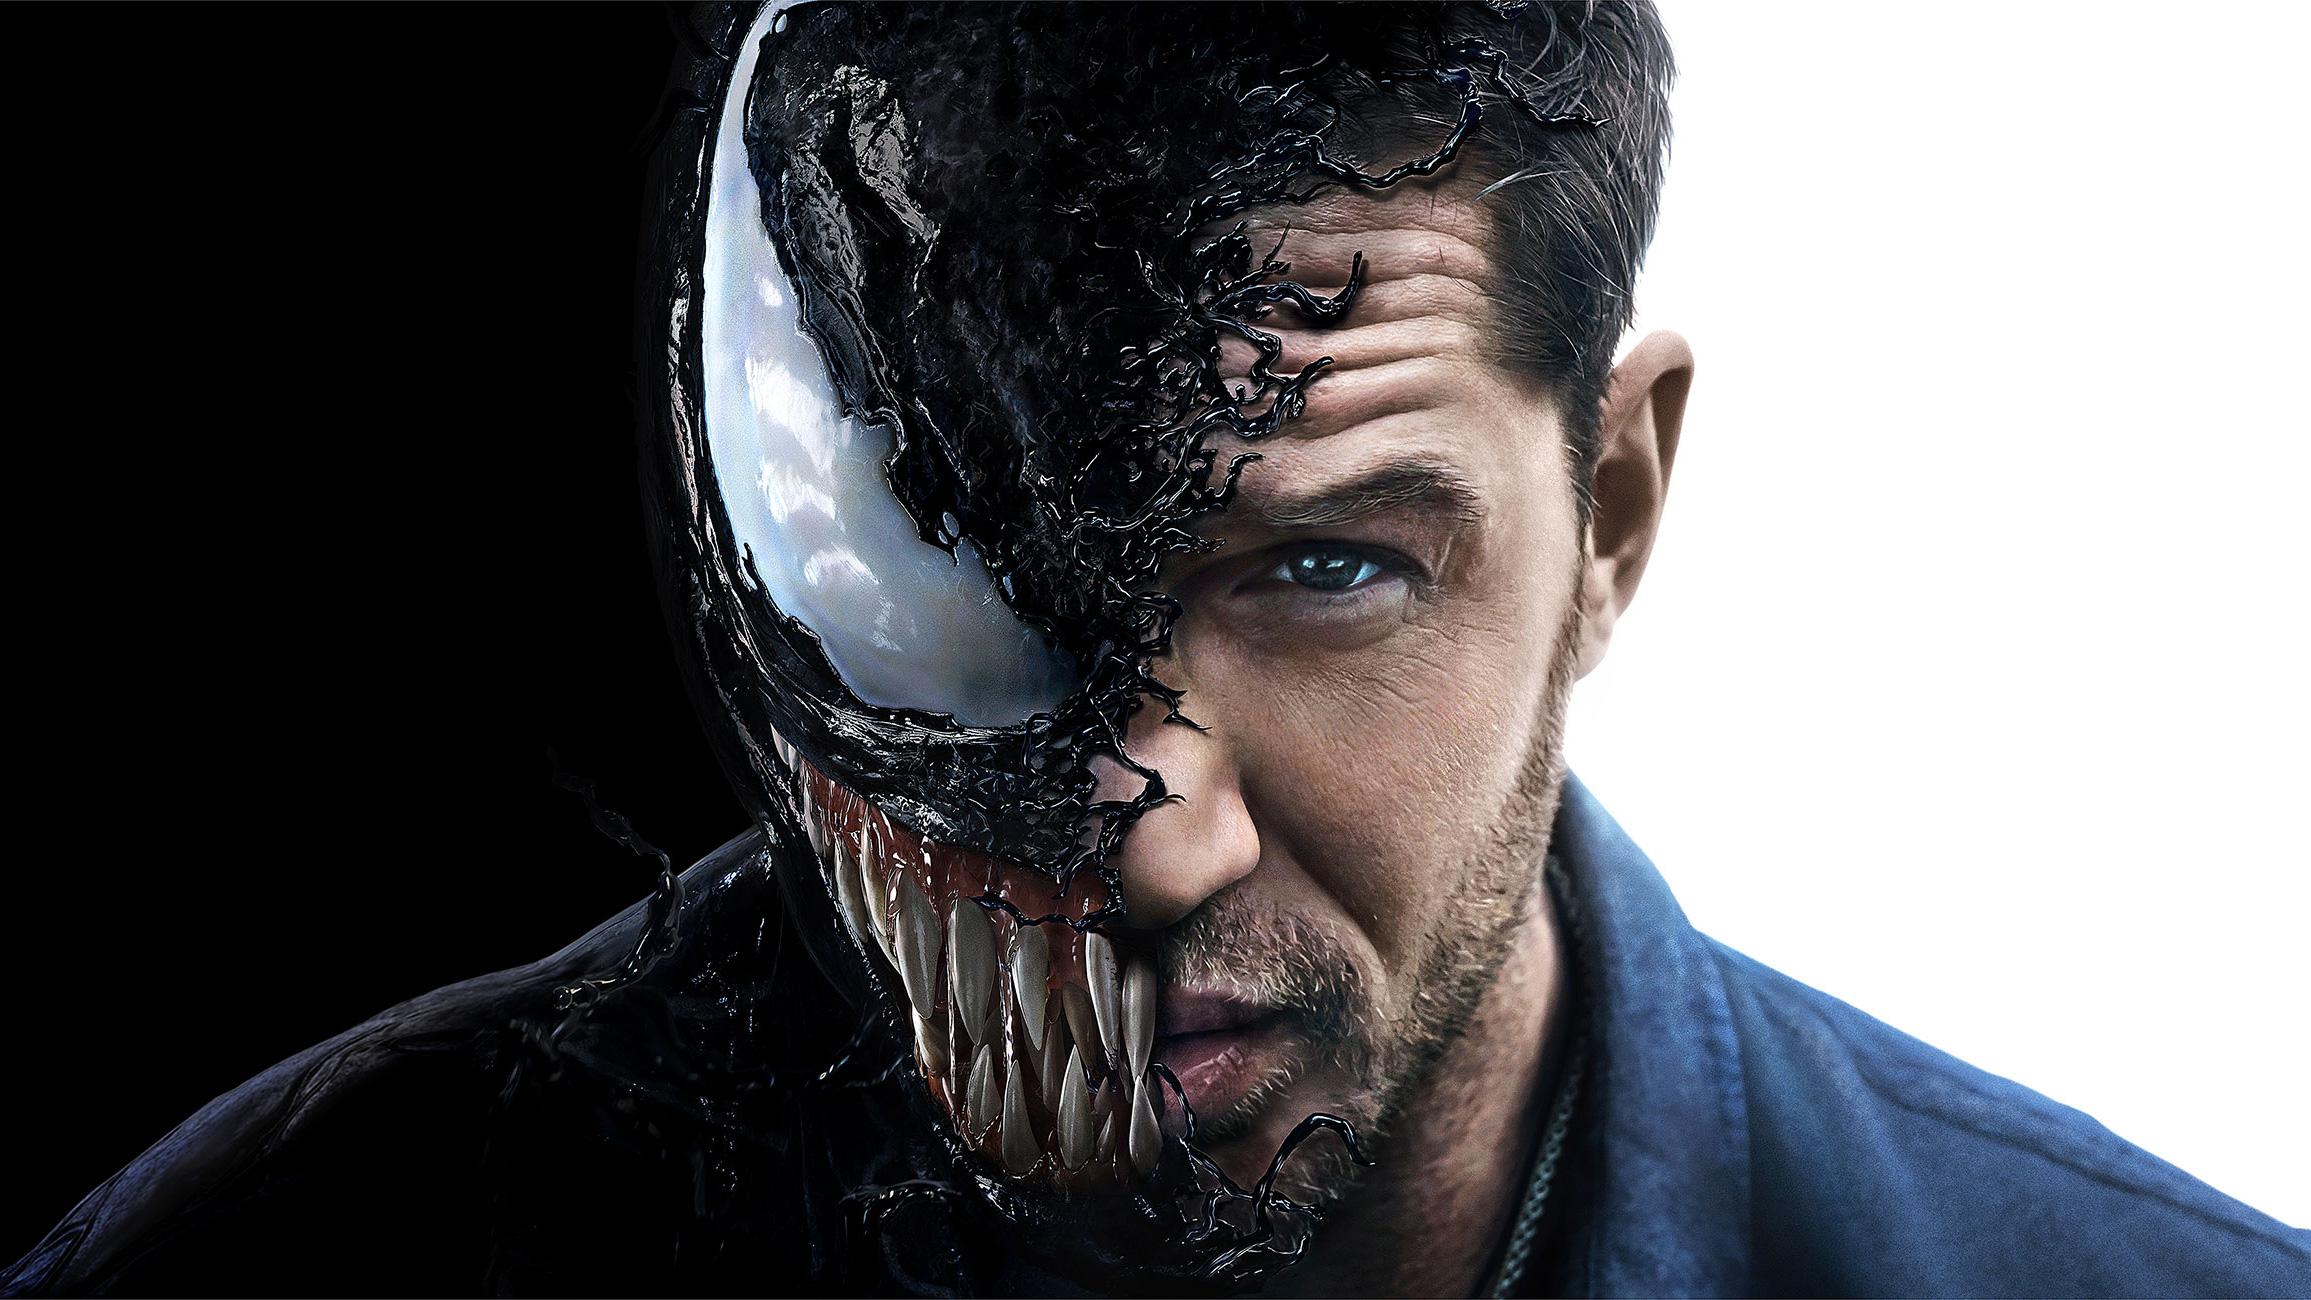 1920x1080 Venom Movie New Poster 2018 Laptop Full HD 1080P ...